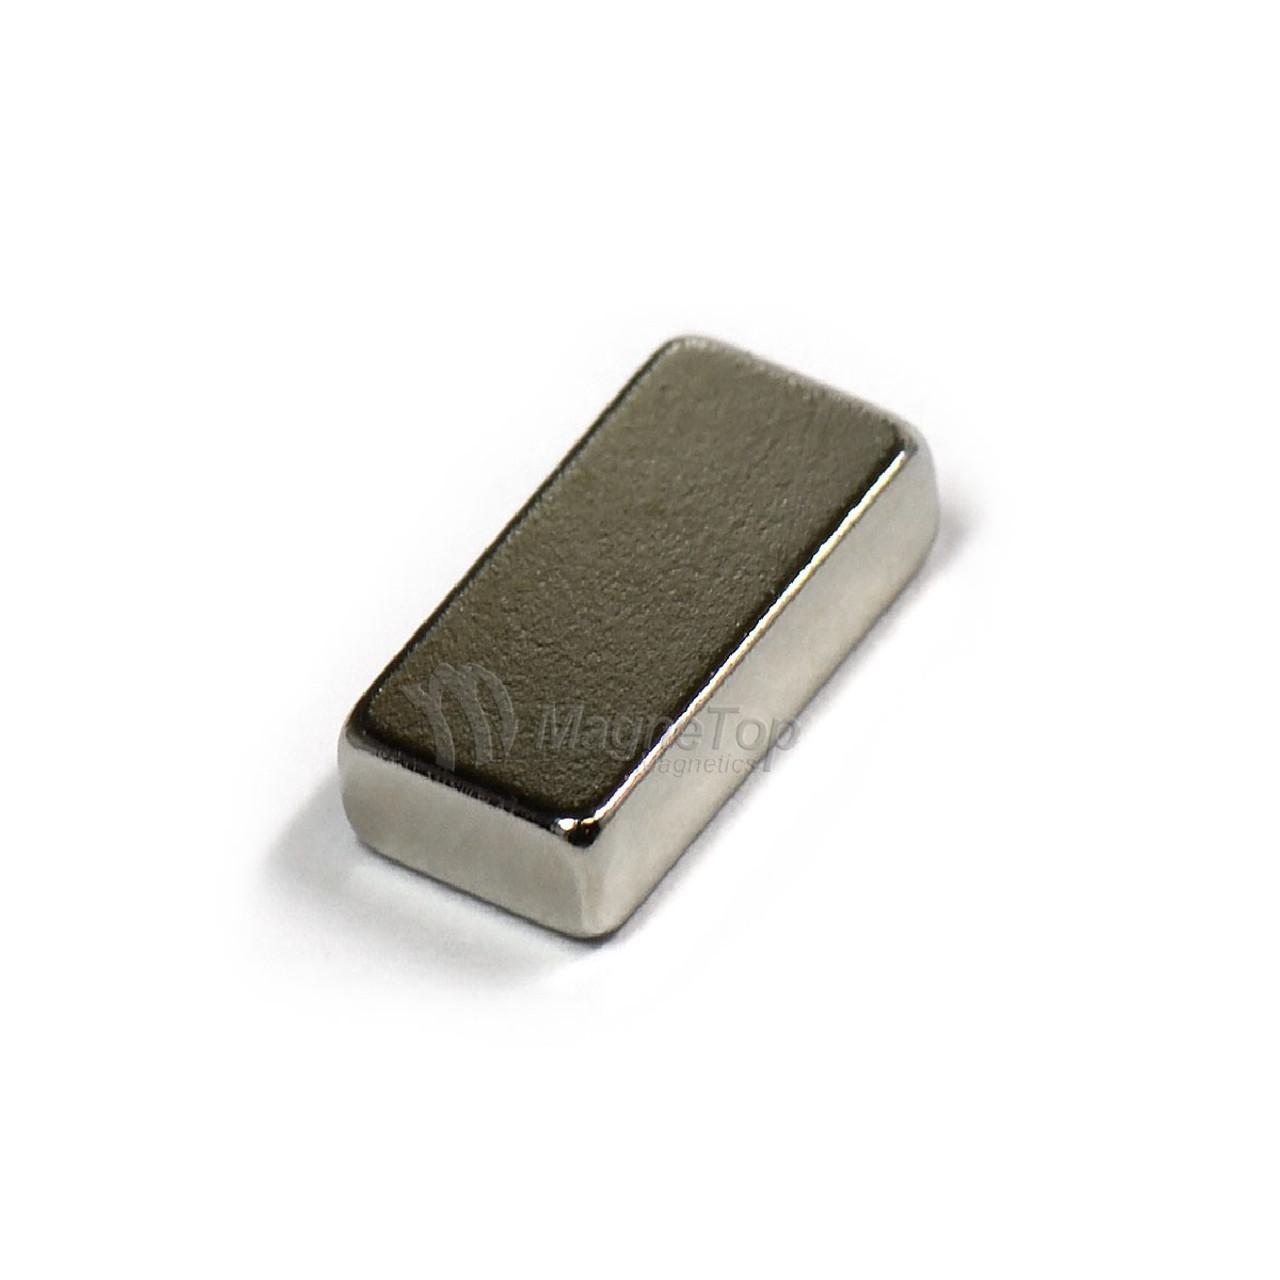 Neodymium Block  -  8mm x 4mm x 2.5mm - N48